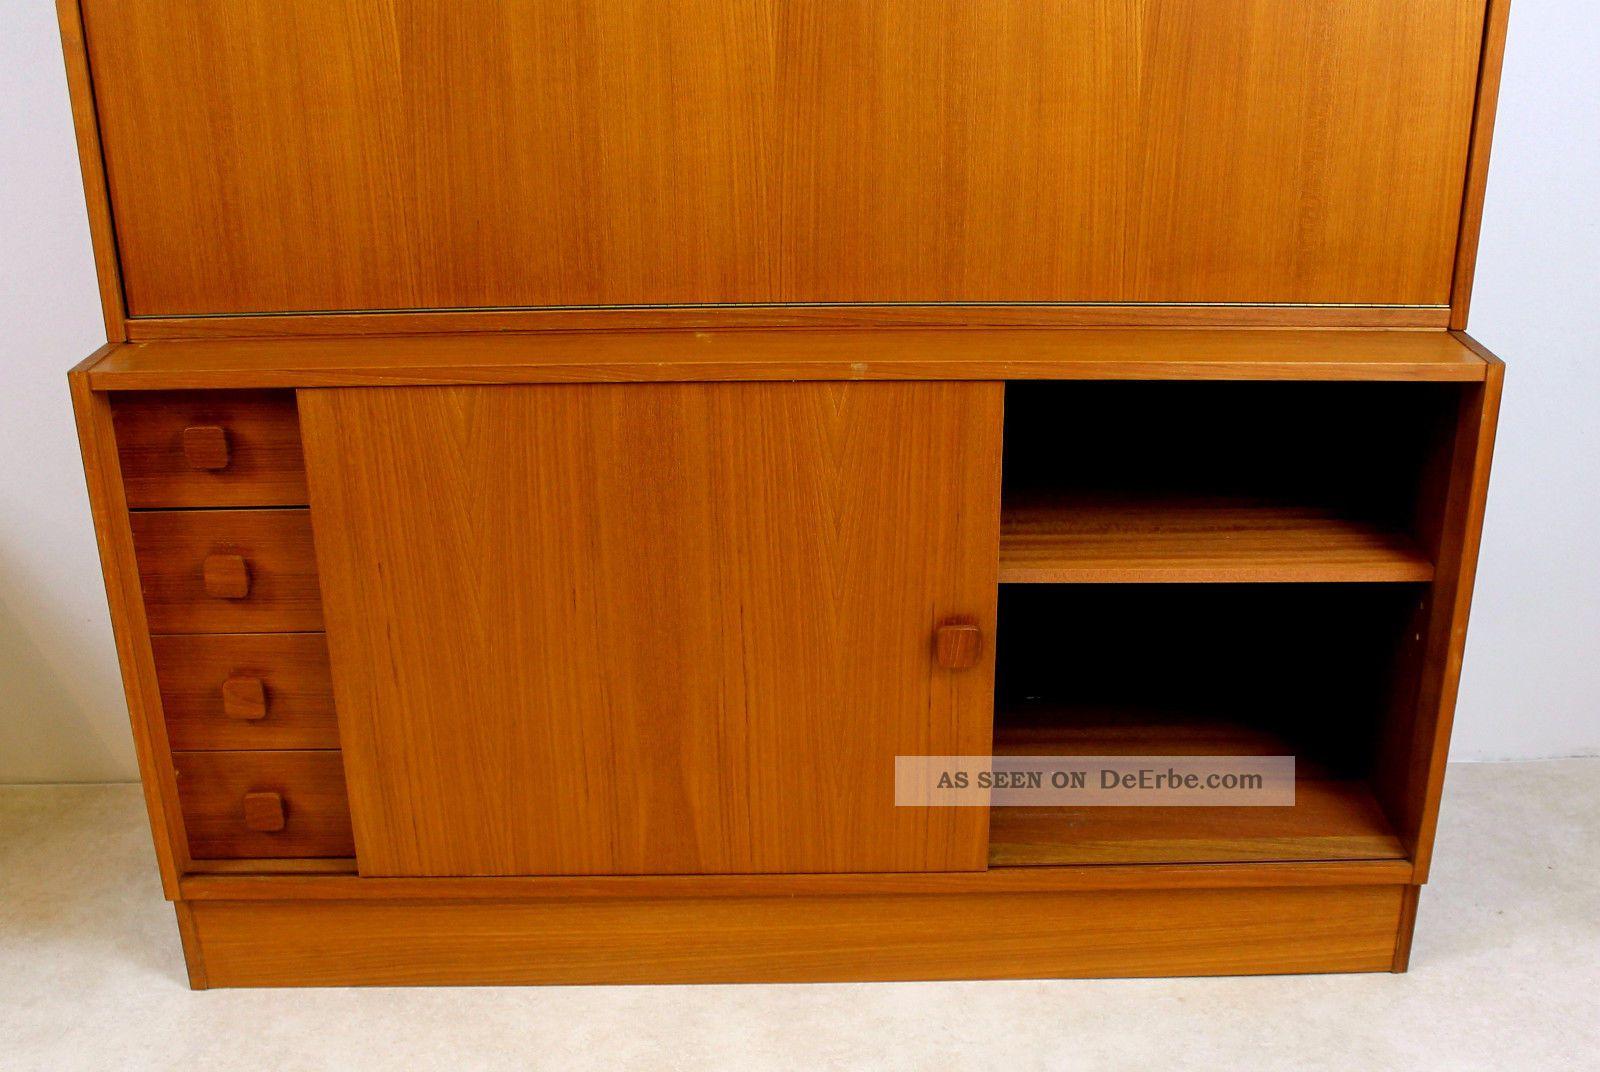 teak sekret r schrank vitrine kommode danish design domino. Black Bedroom Furniture Sets. Home Design Ideas